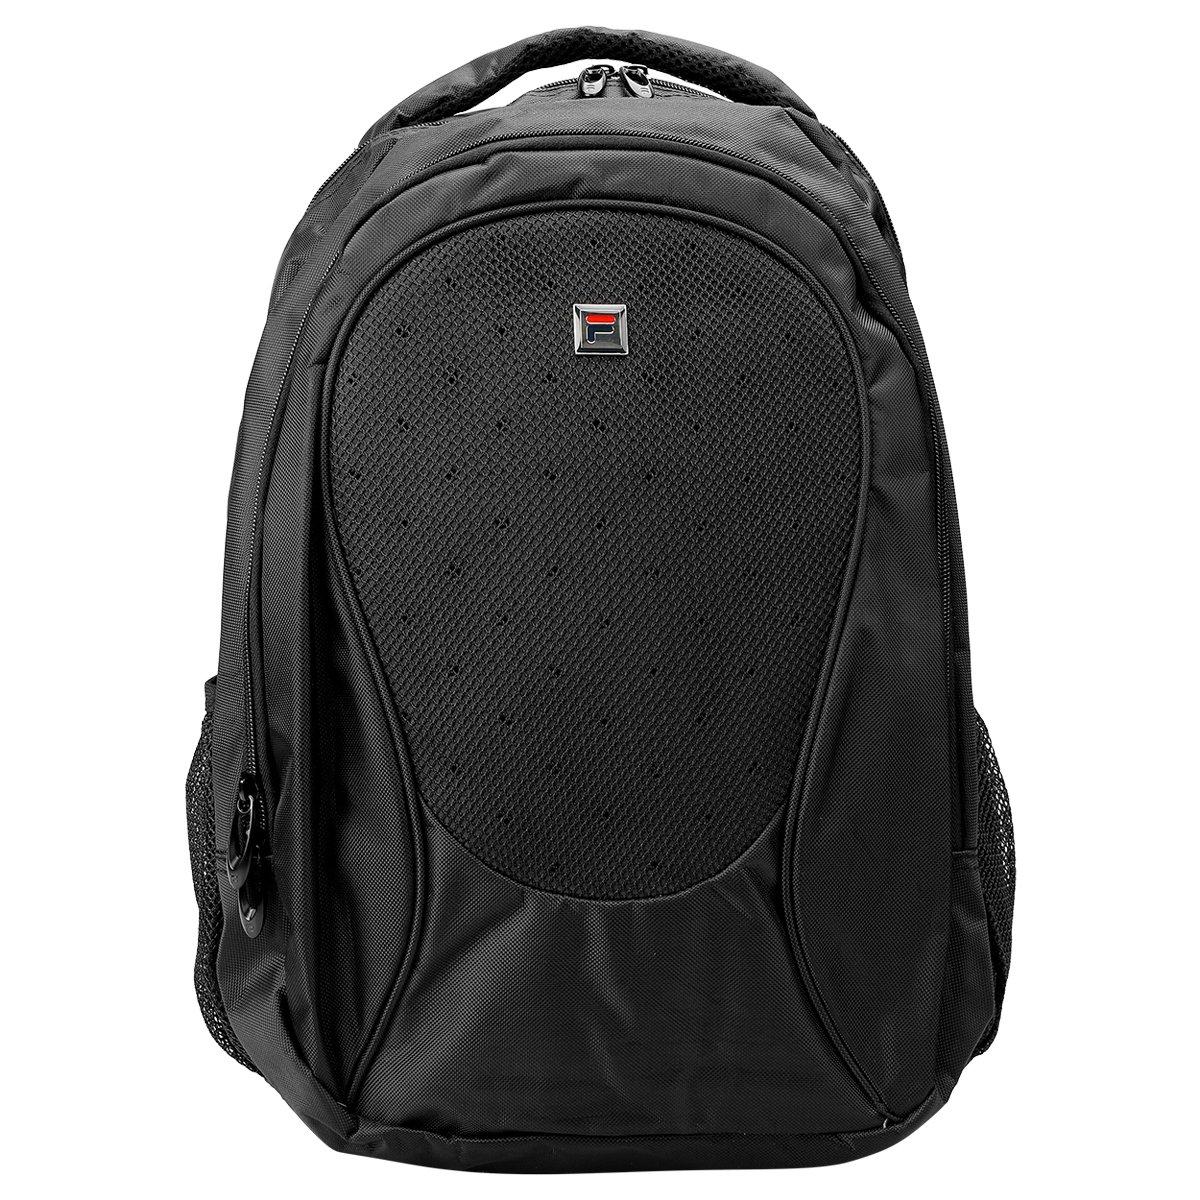 Mochila Fila Tech - Preto - Compre Agora  1a448b820d6